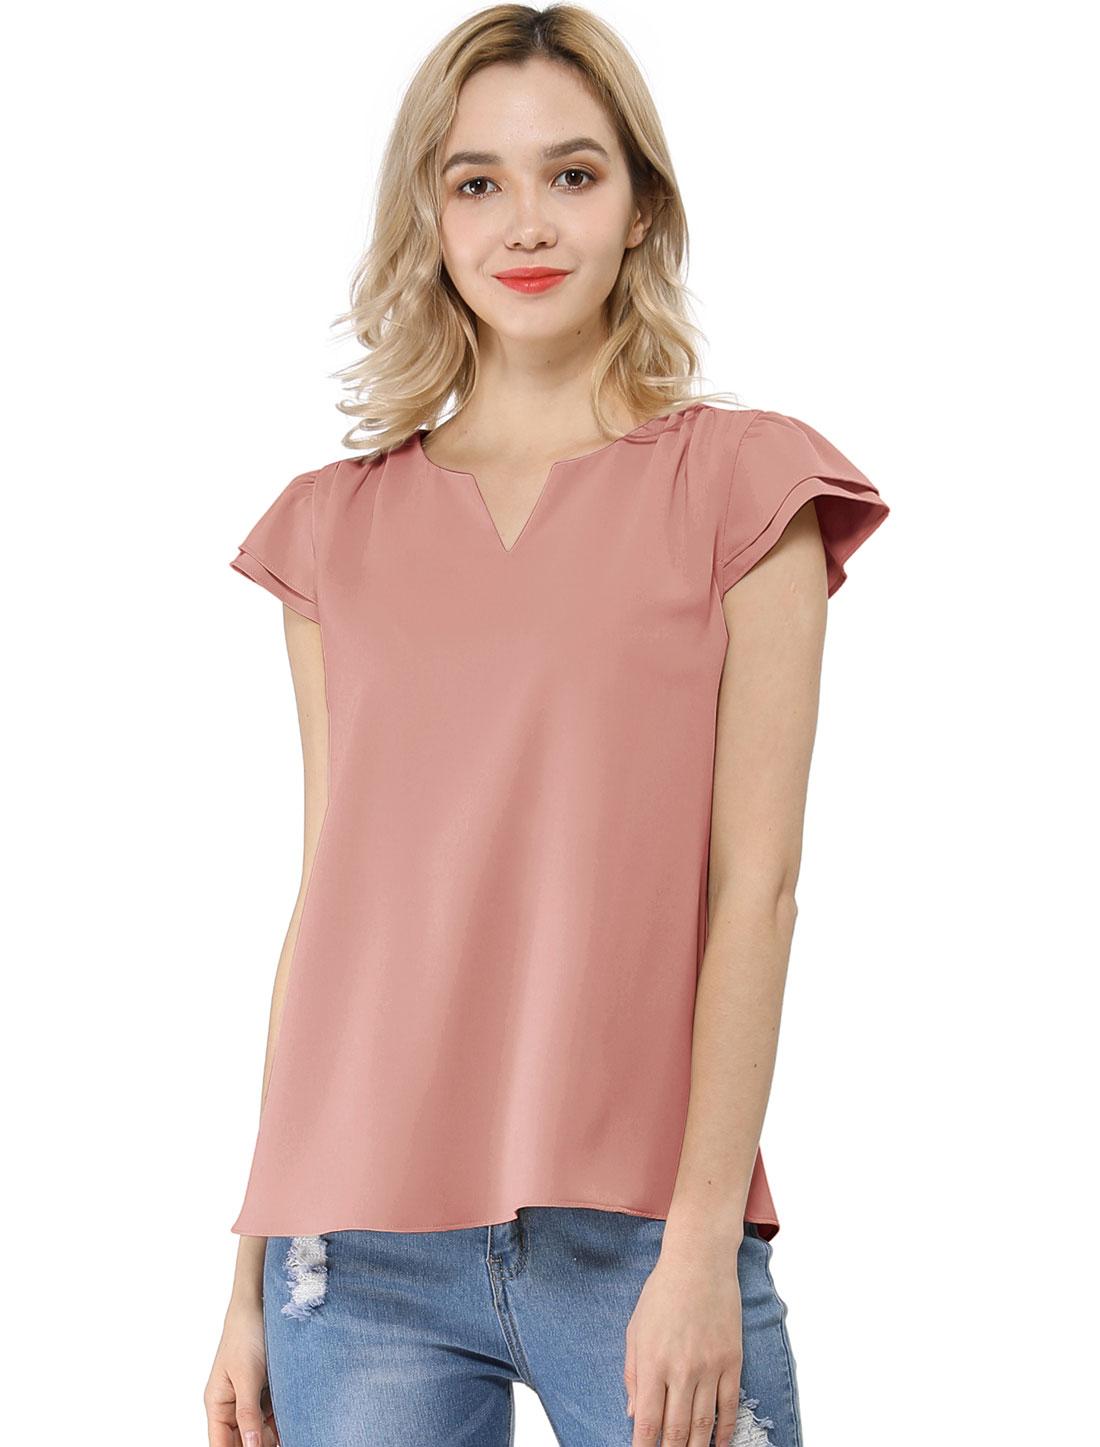 Allegra K Women's Work Business Casual Cap Sleeve Blouse Pink L